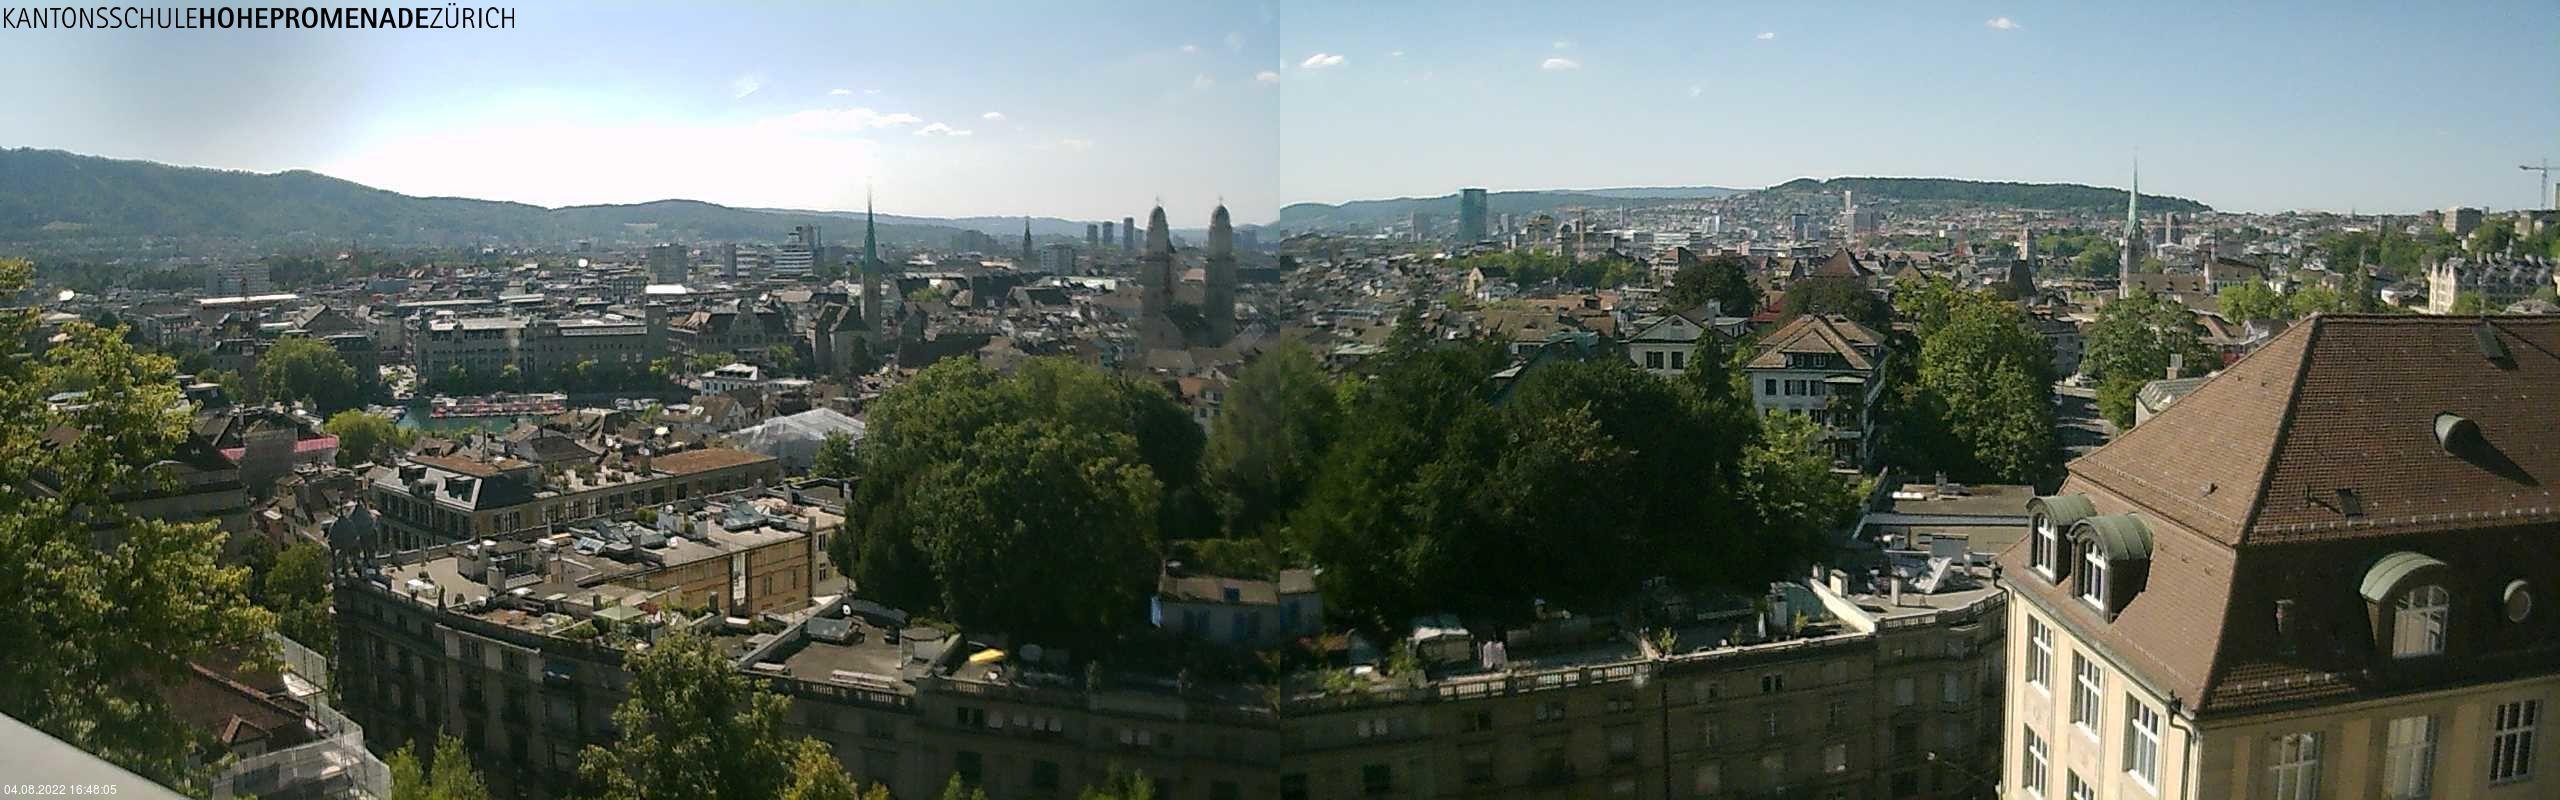 Zürich: Panorama